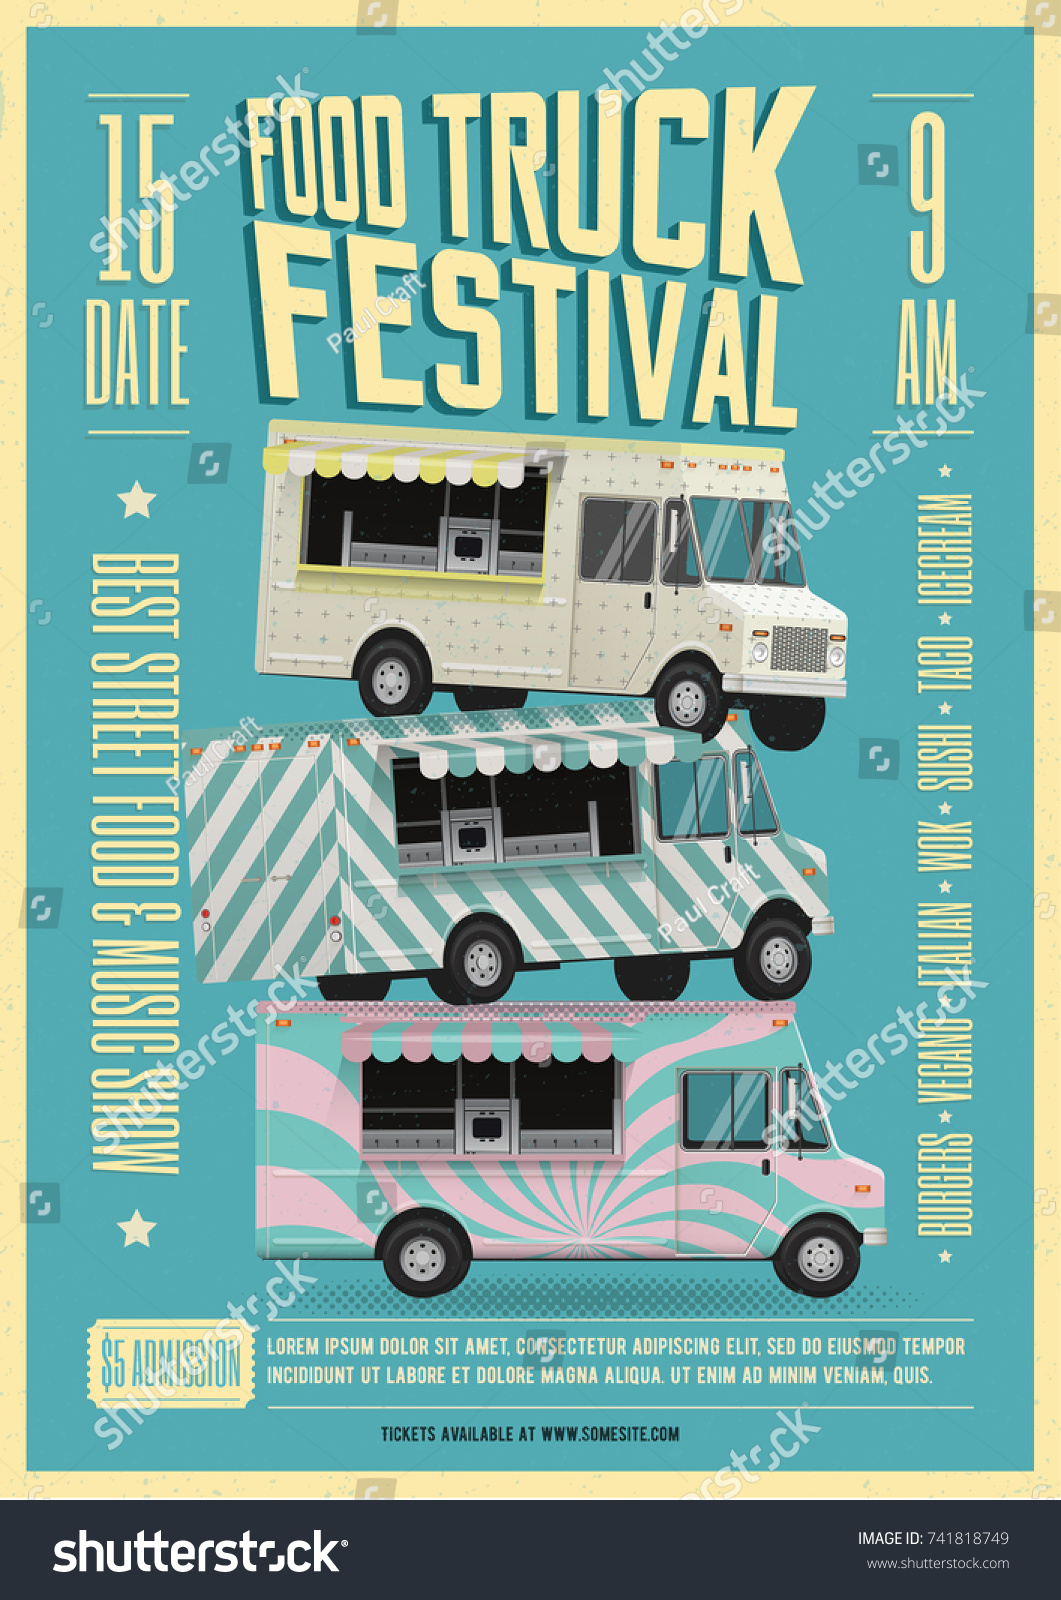 Food Truck Festival Poster Flyer Template Vectores En Stock ...